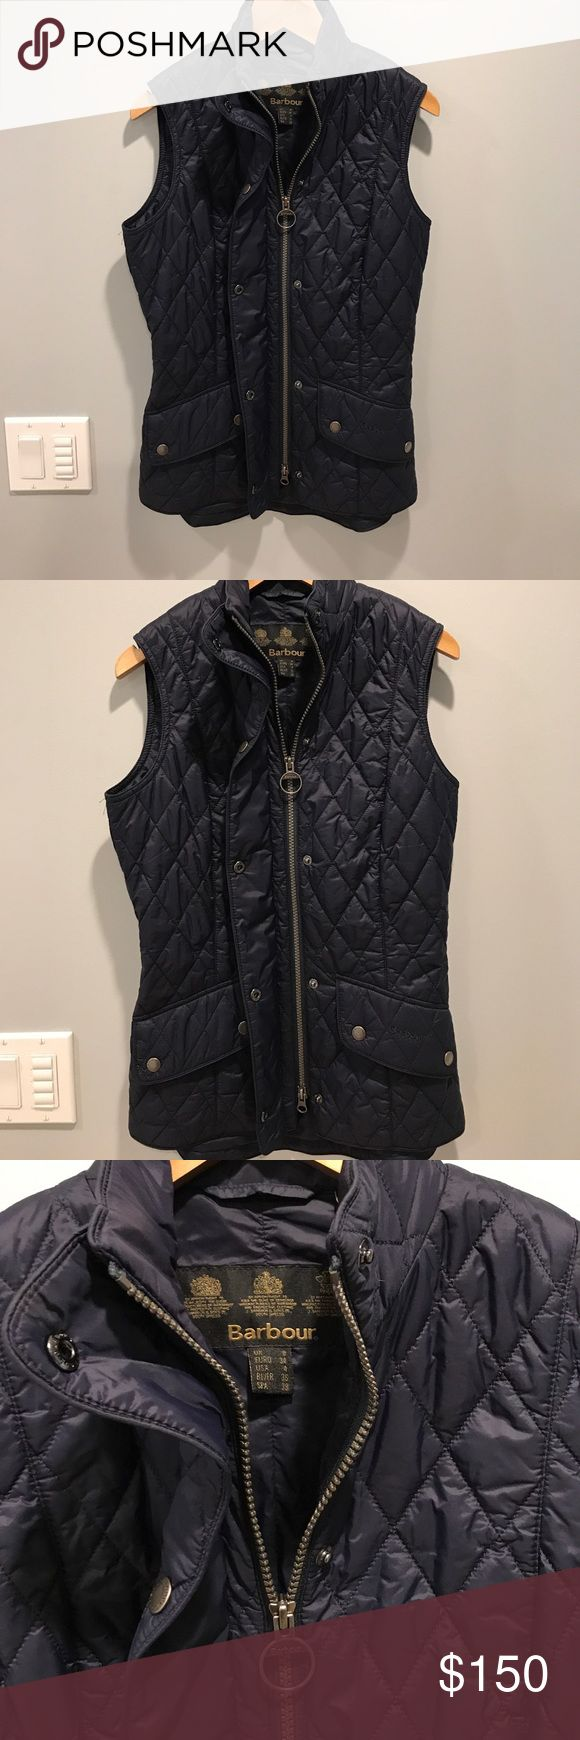 Barbour vest! Size 4! Navy blue! Never worn! New never worn! Barbour Jackets & Coats Vests